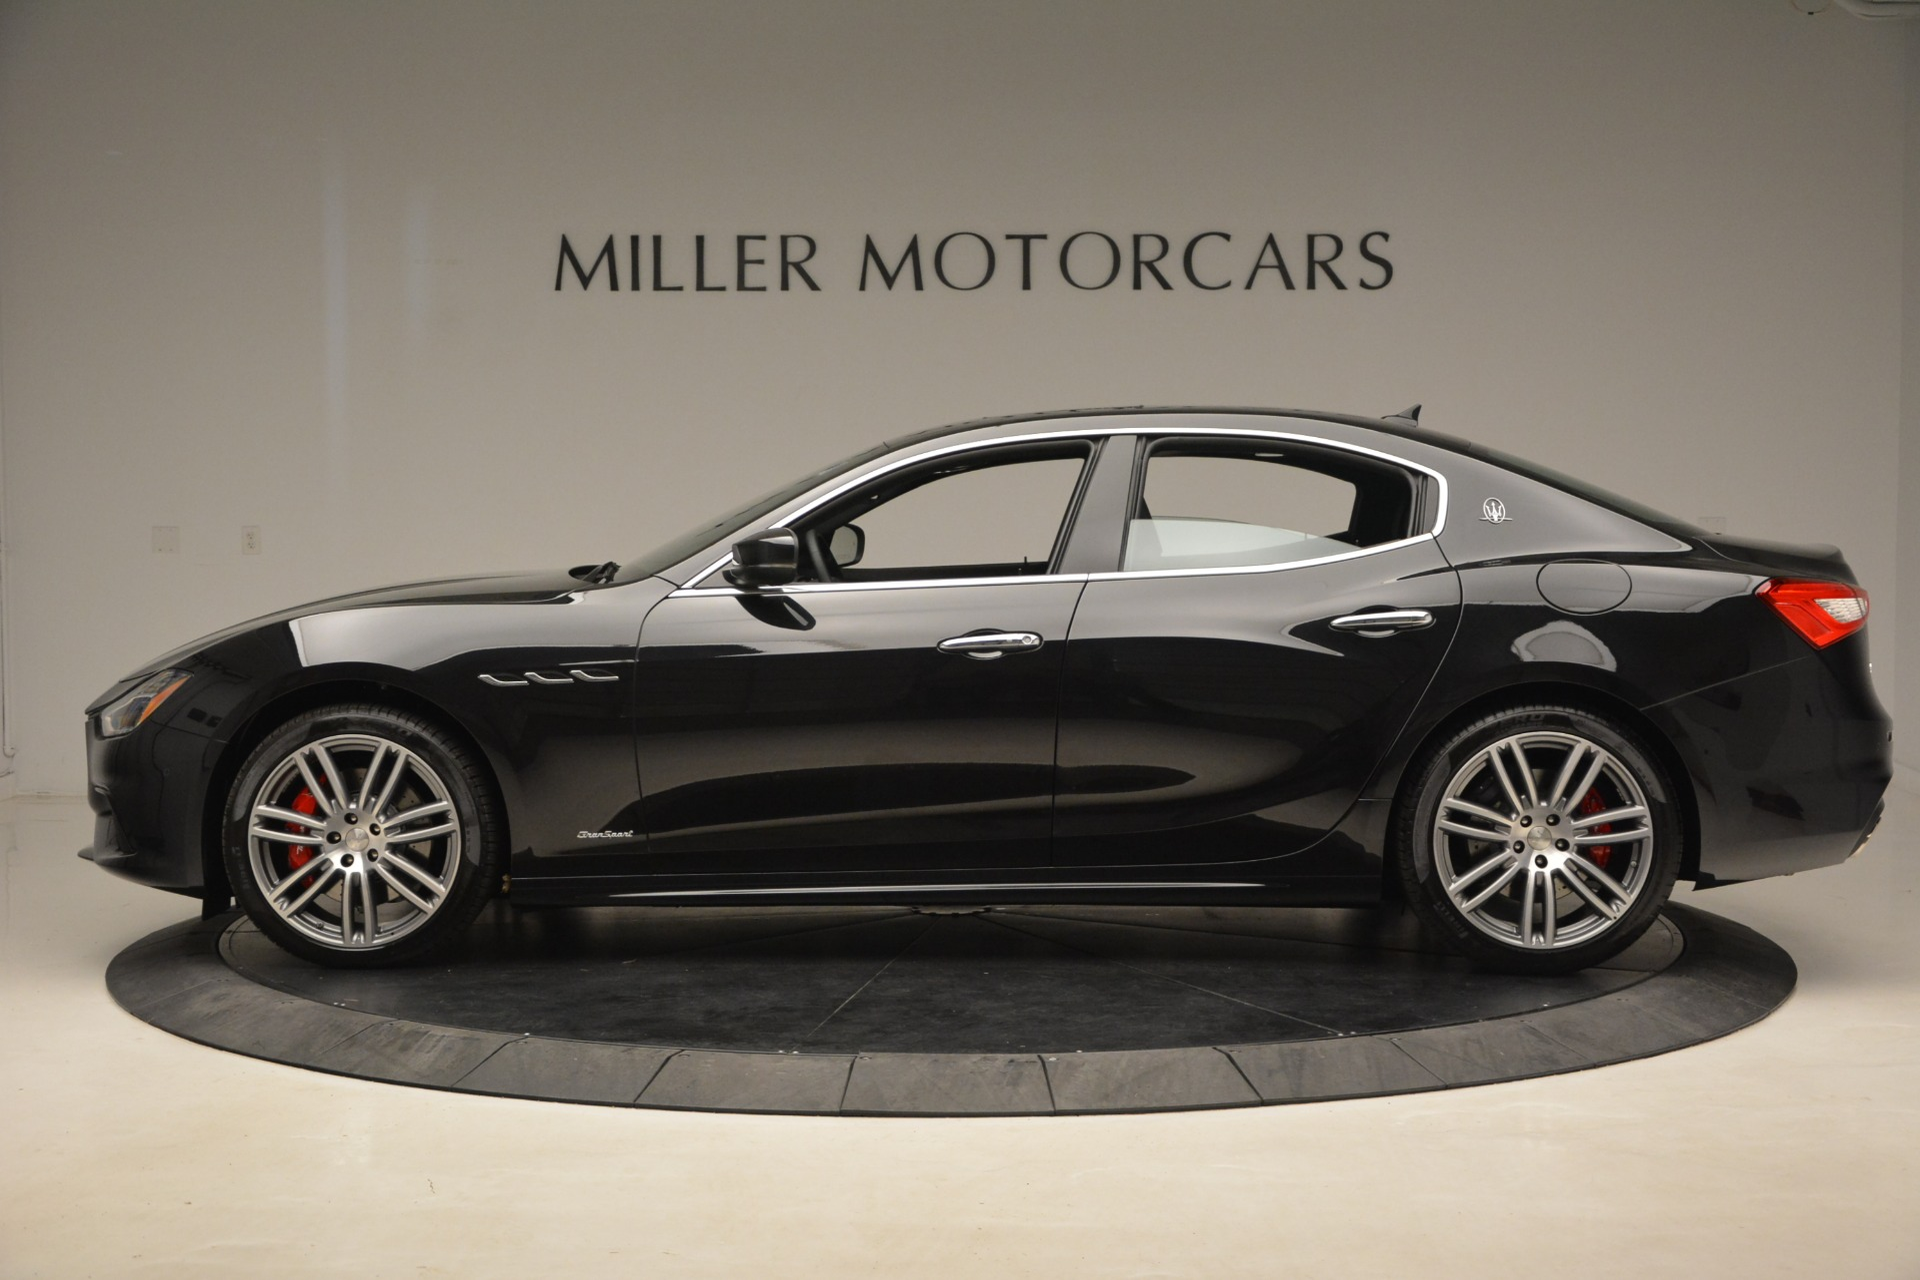 New 2019 Maserati Ghibli S Q4 GranSport For Sale In Greenwich, CT 2597_p3